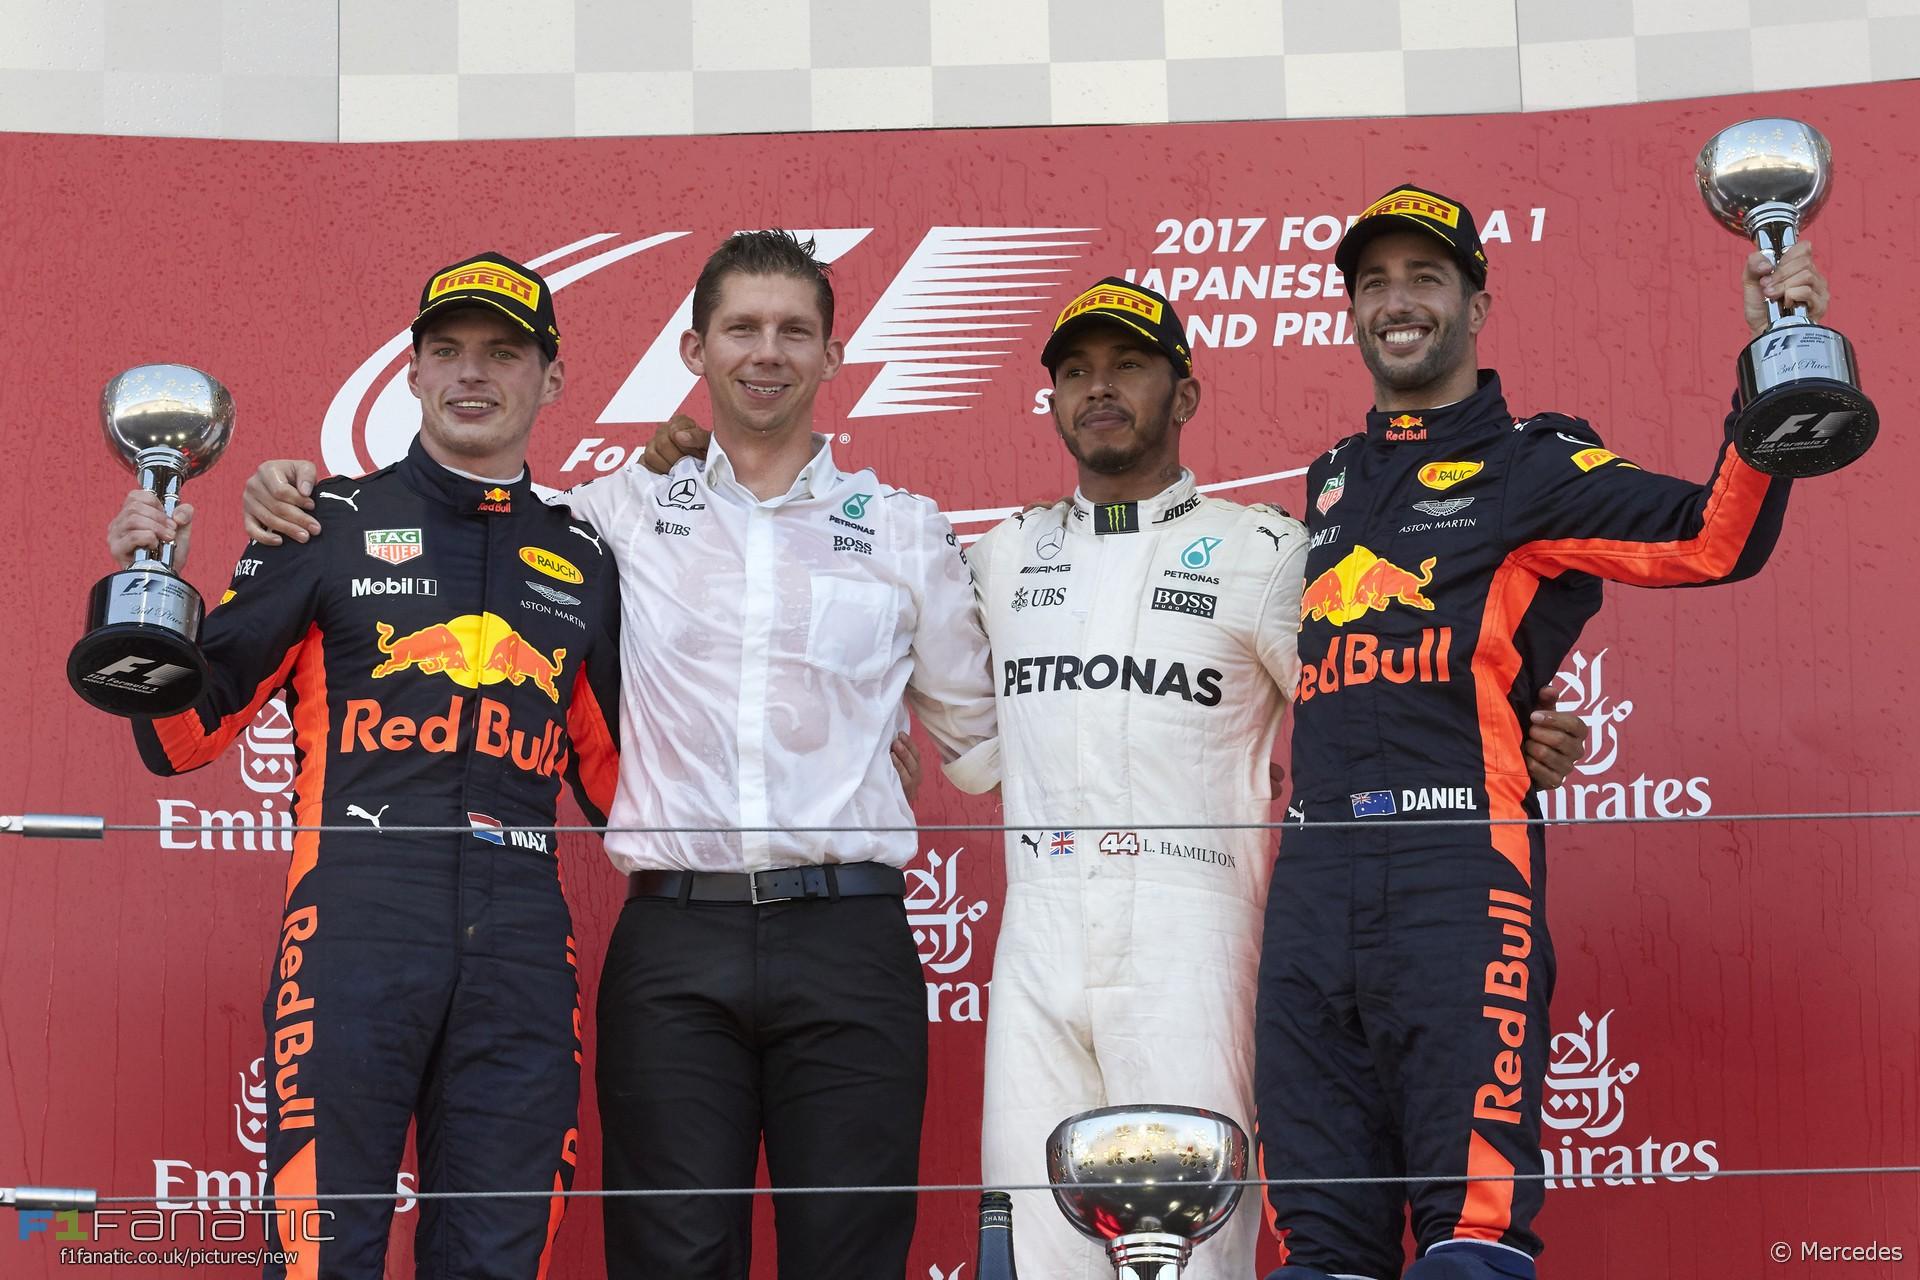 Max Verstappen, Lewis Hamilton, Daniel Ricciardo, Suzuka, 2017